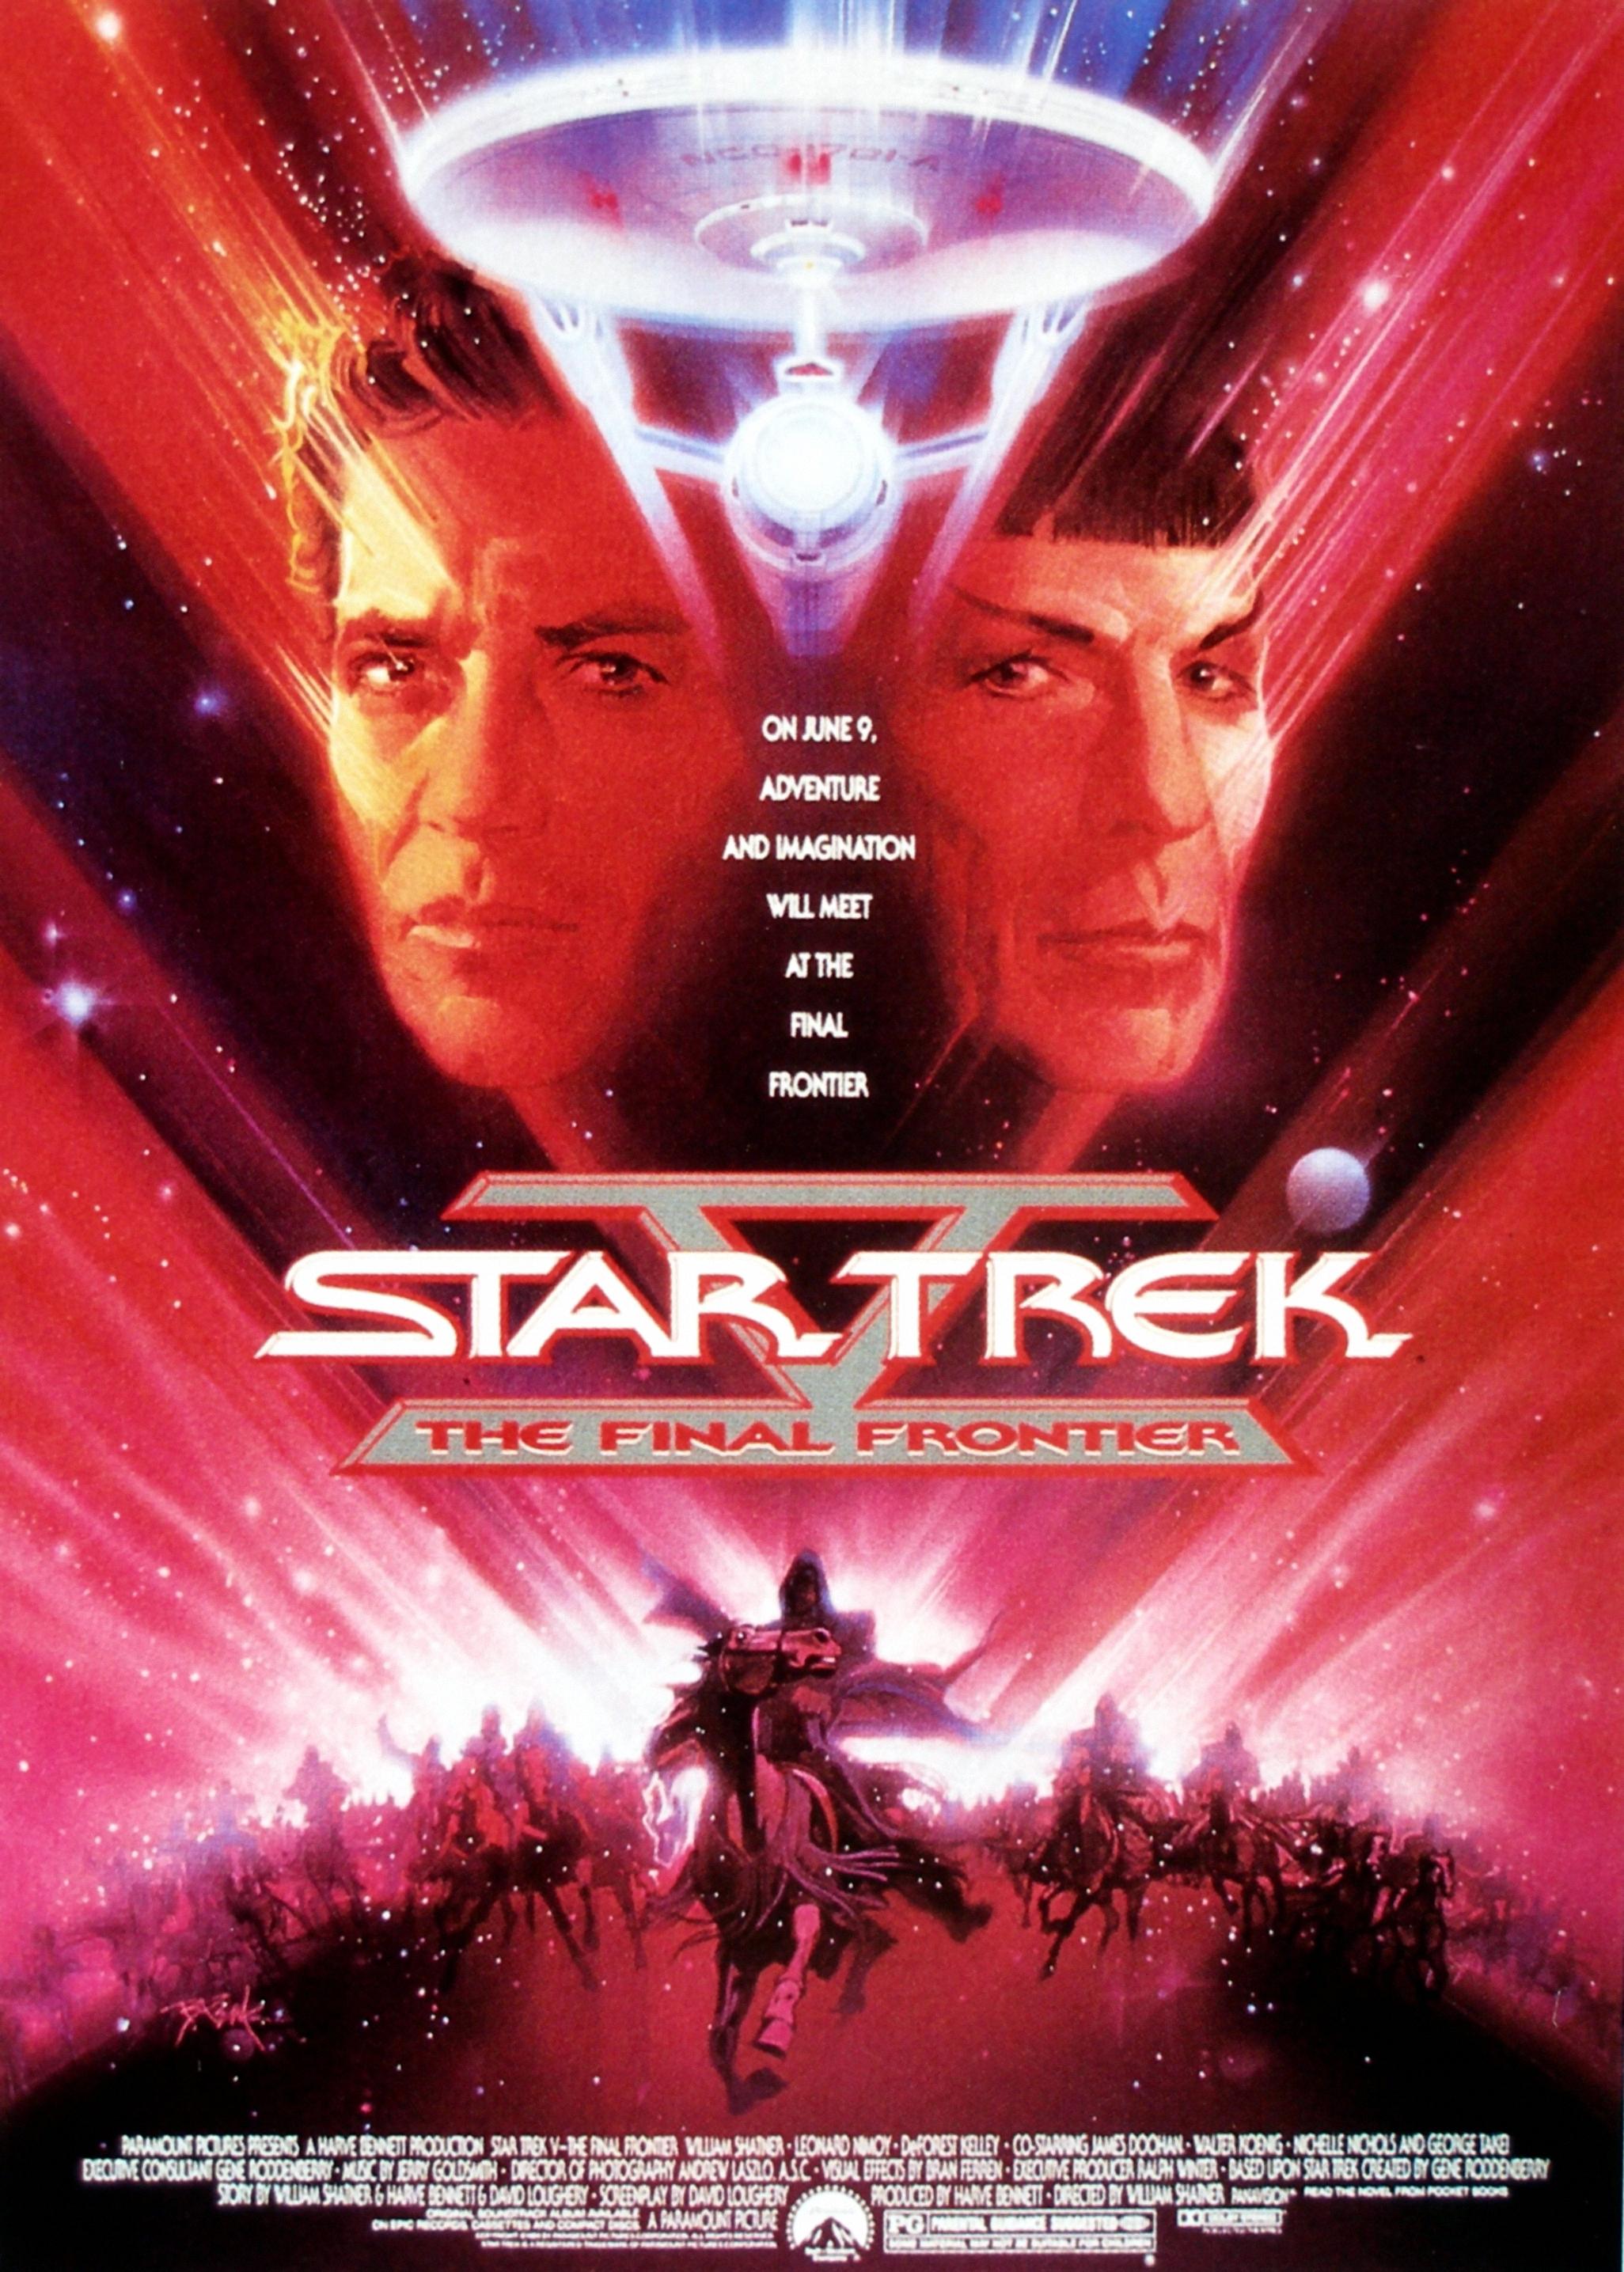 star-trek-v-the-final-frontier movie poster.jpg